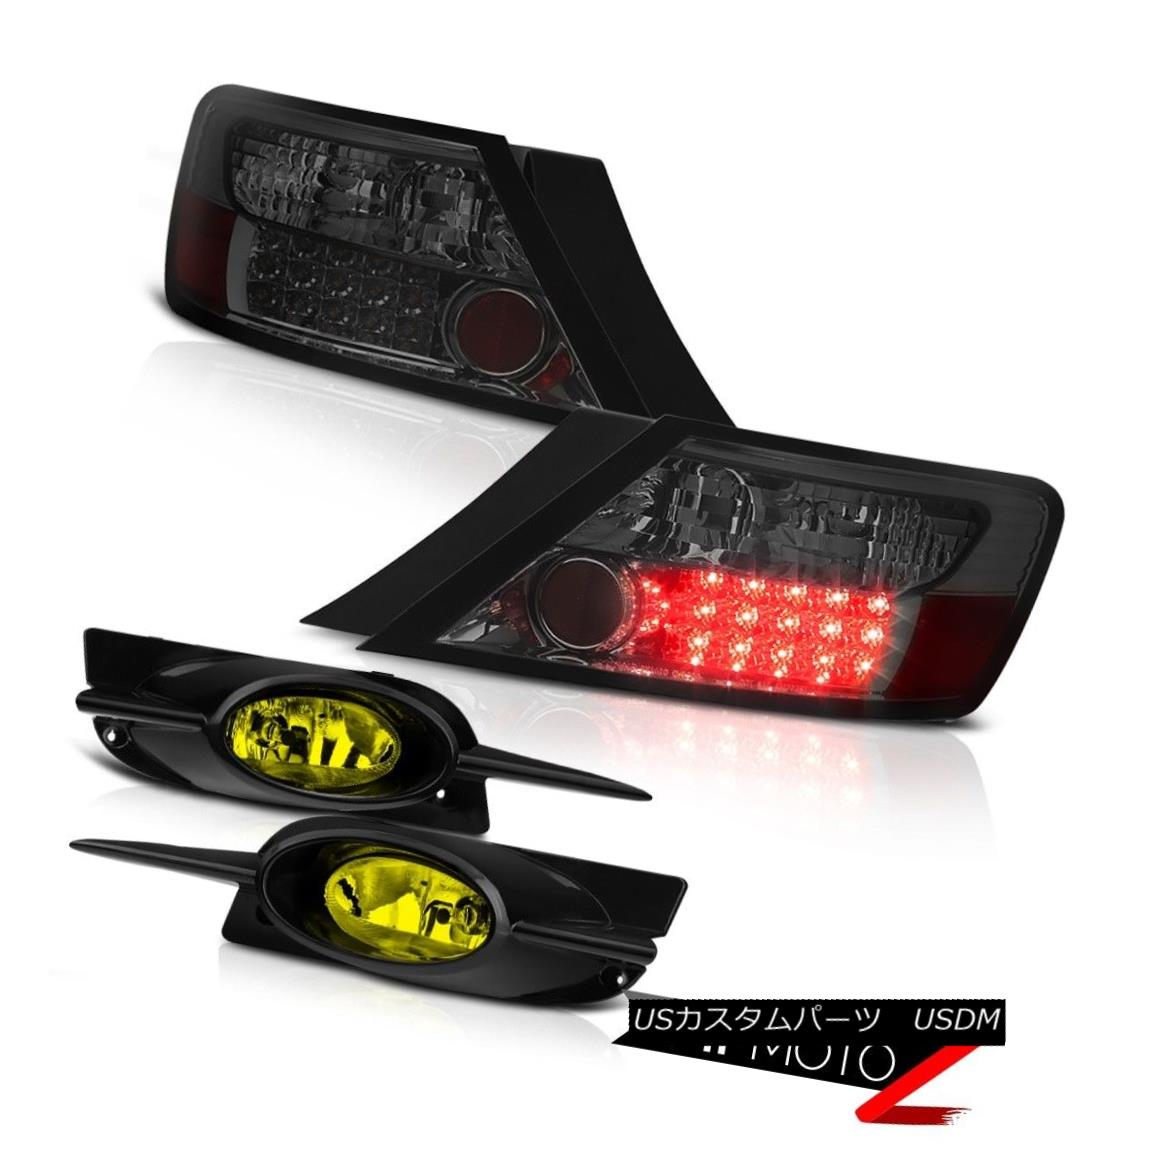 2009-2011 HONDA CIVIC Sedan Rear Brake Tail Light Right Passenger Side RH